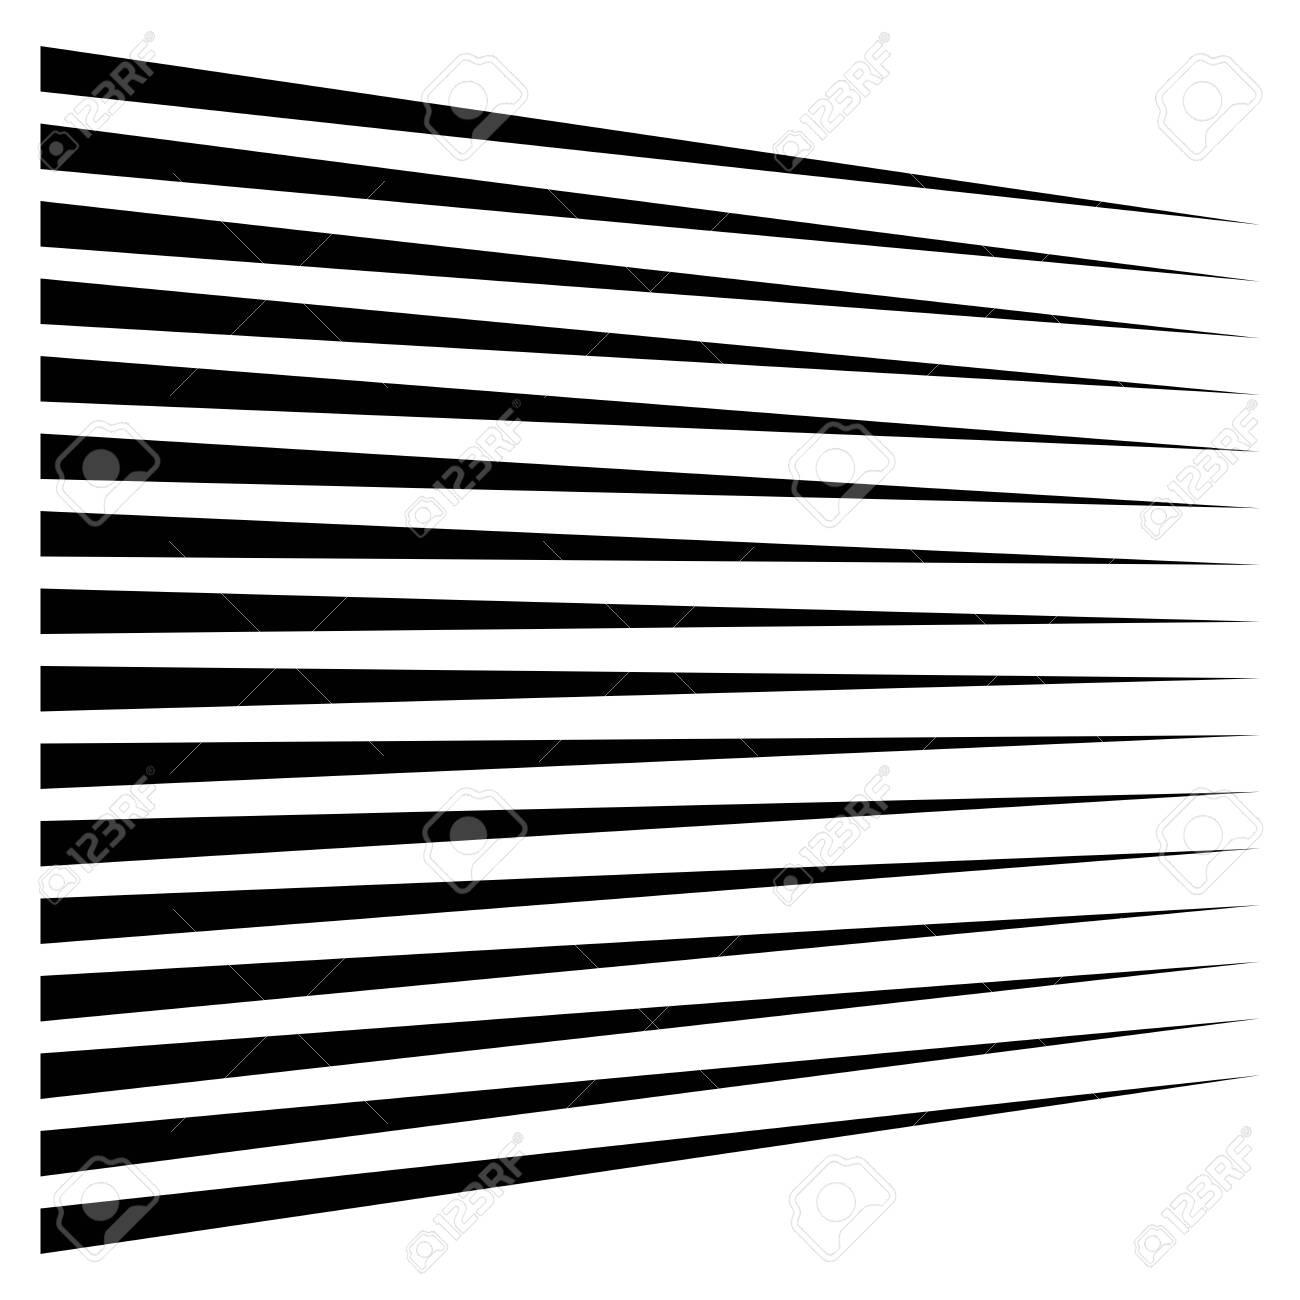 Horizontal lines, stripes. Straight parallel streaks, strips. Edgy pinstripe geometric pattern. Linear, lineal geometric design. - 131302799